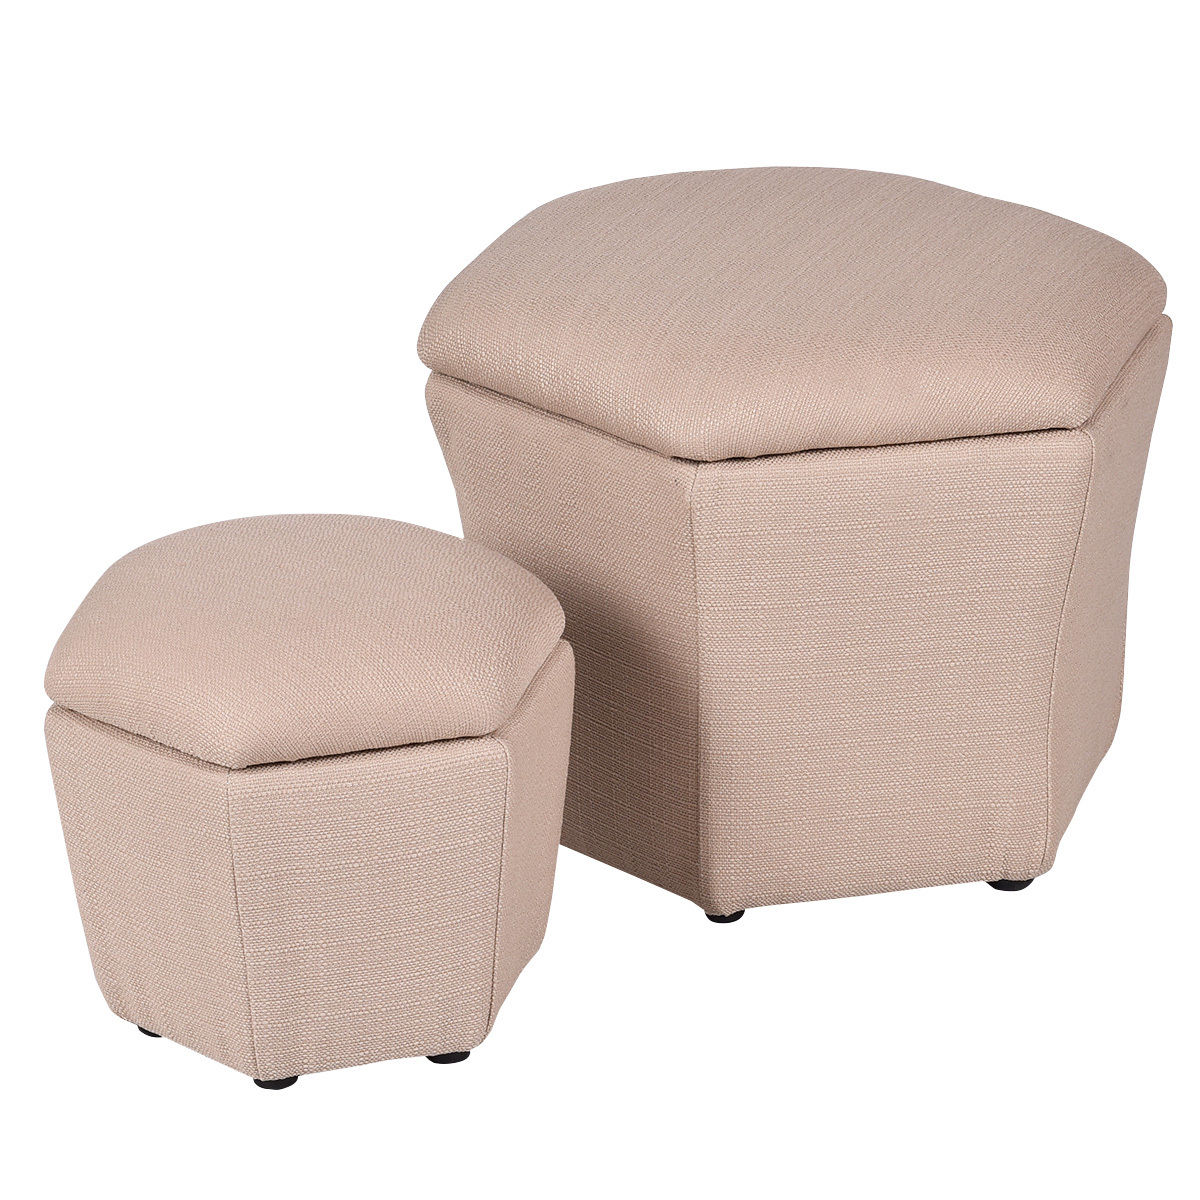 Costway Set of 2 Ottoman Set Storage Box Seat Footstool Rest Bench Organizer by Costway